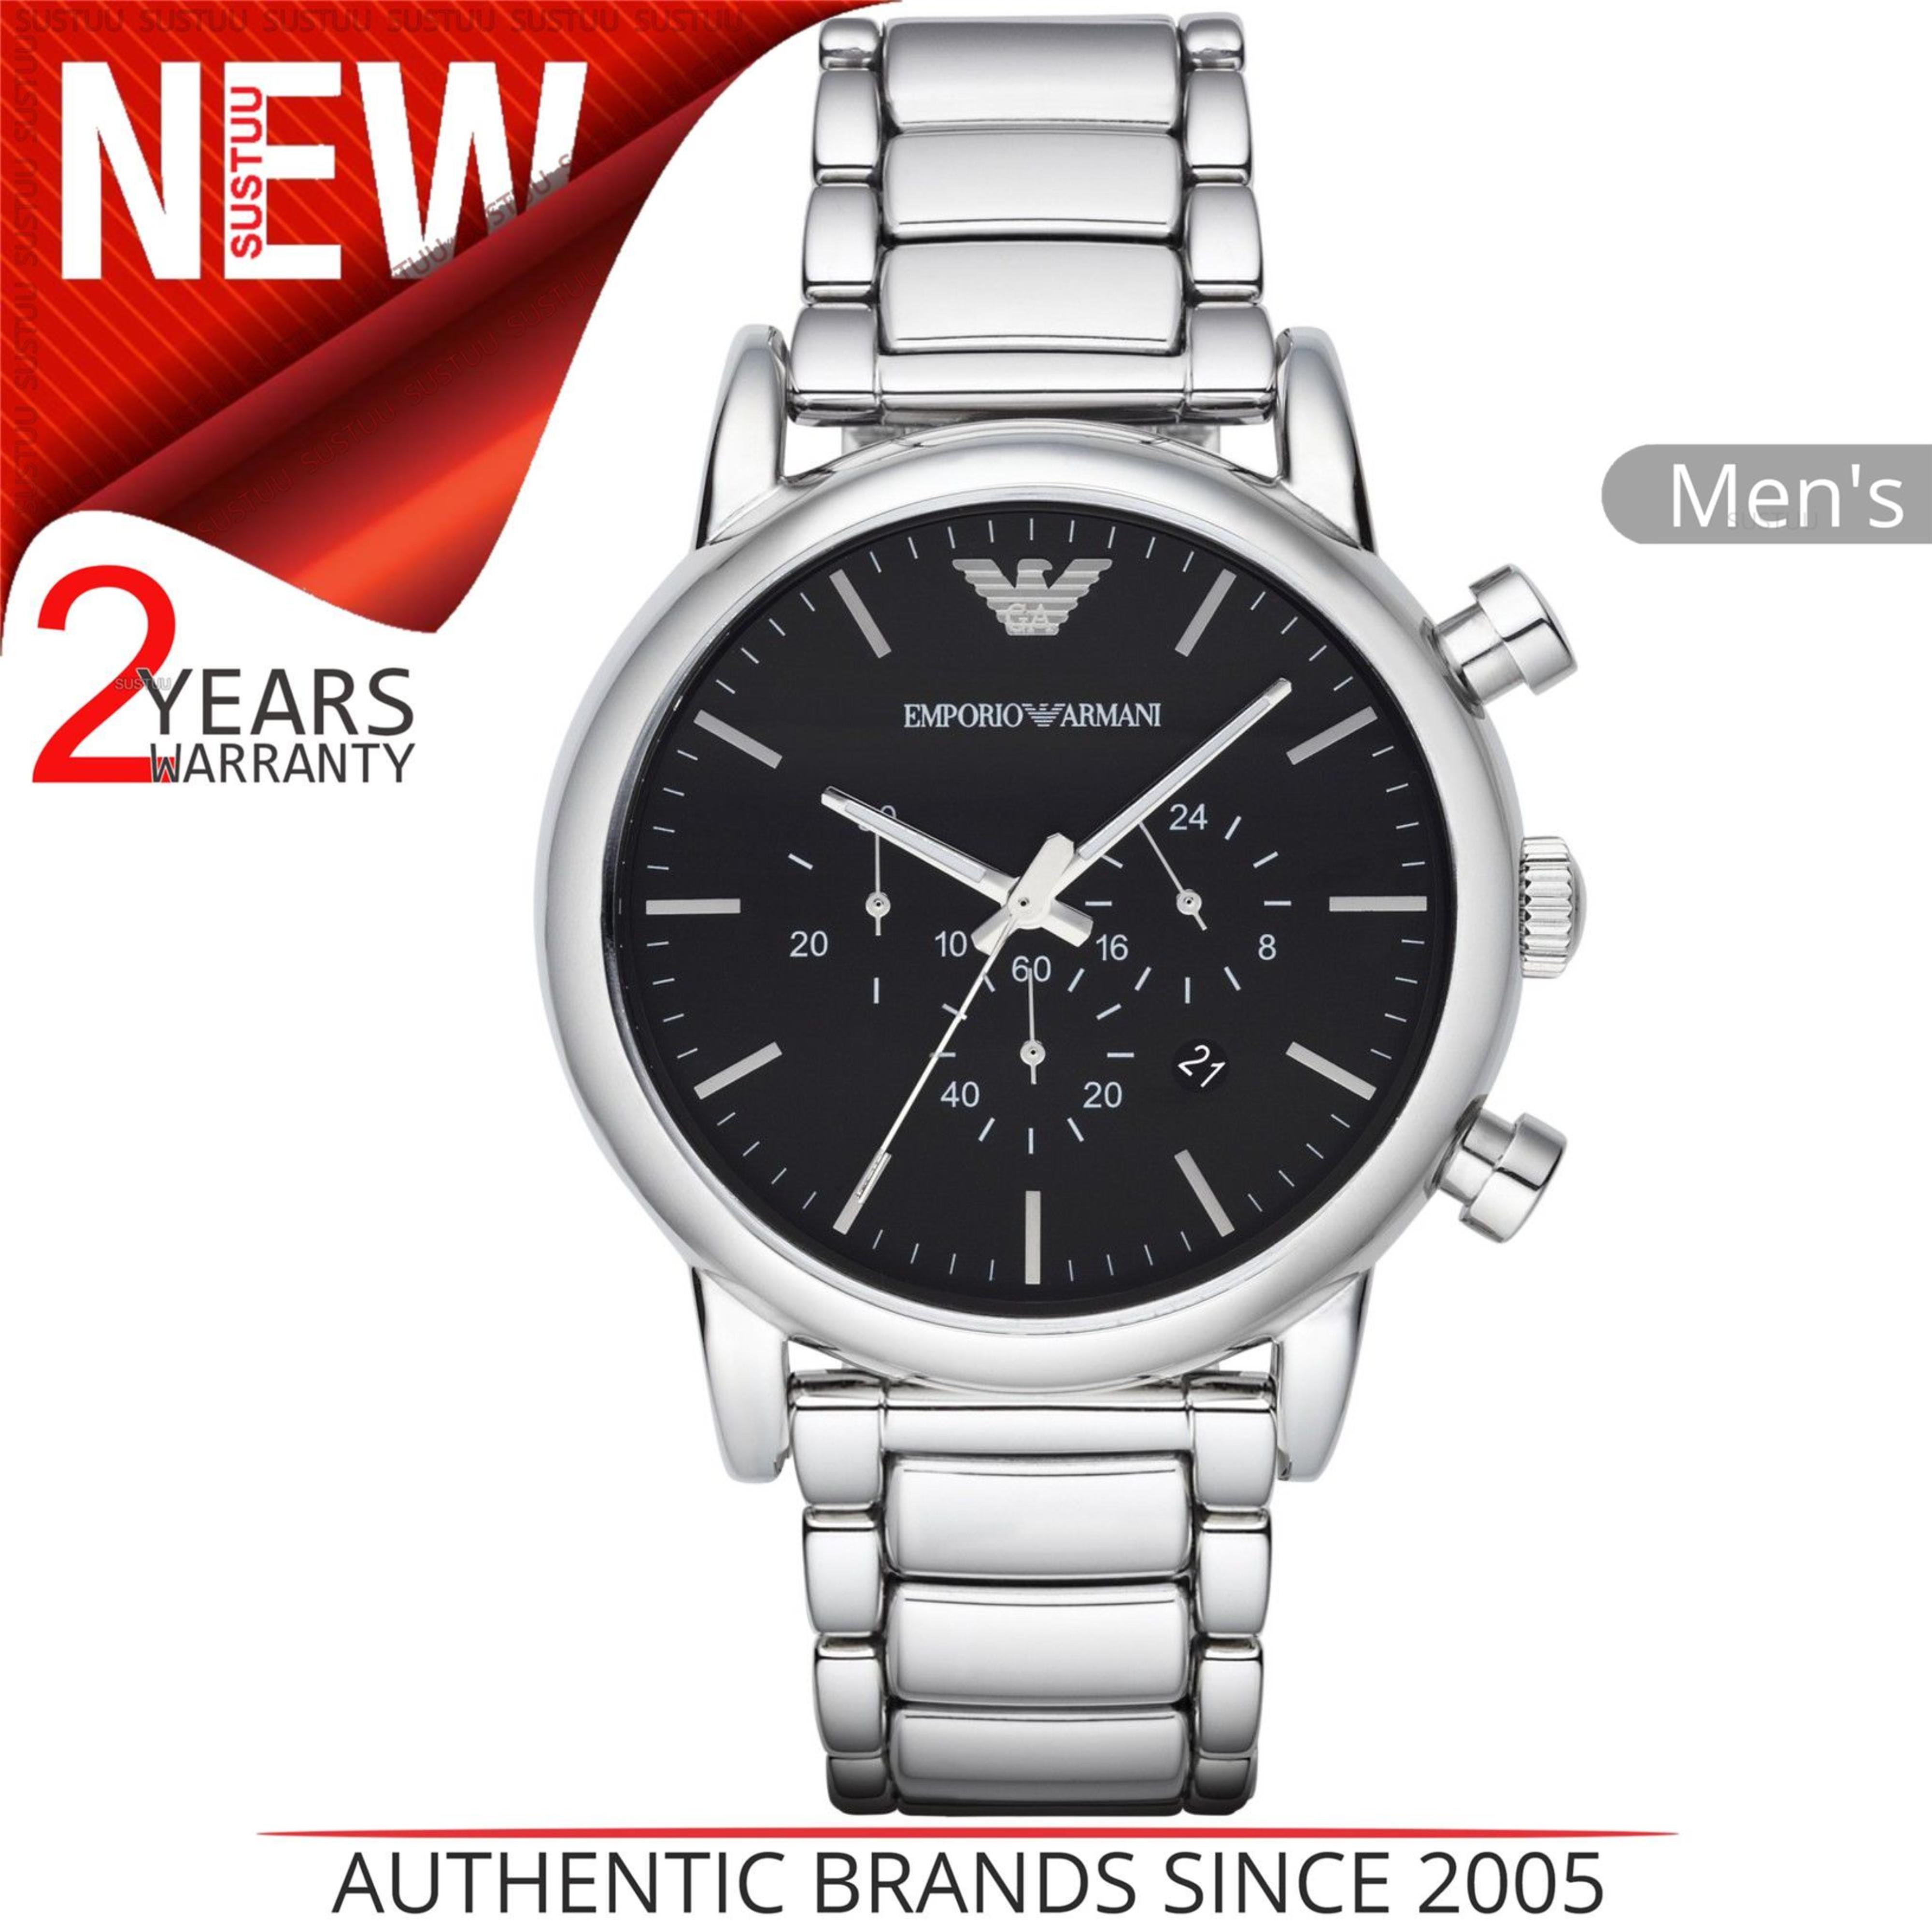 c1118cbfca49 CENTINELA Reloj Emporio Armani Classic para hombre AR1853 │ Dial cronógrafo  negro Steel Acero inoxidable